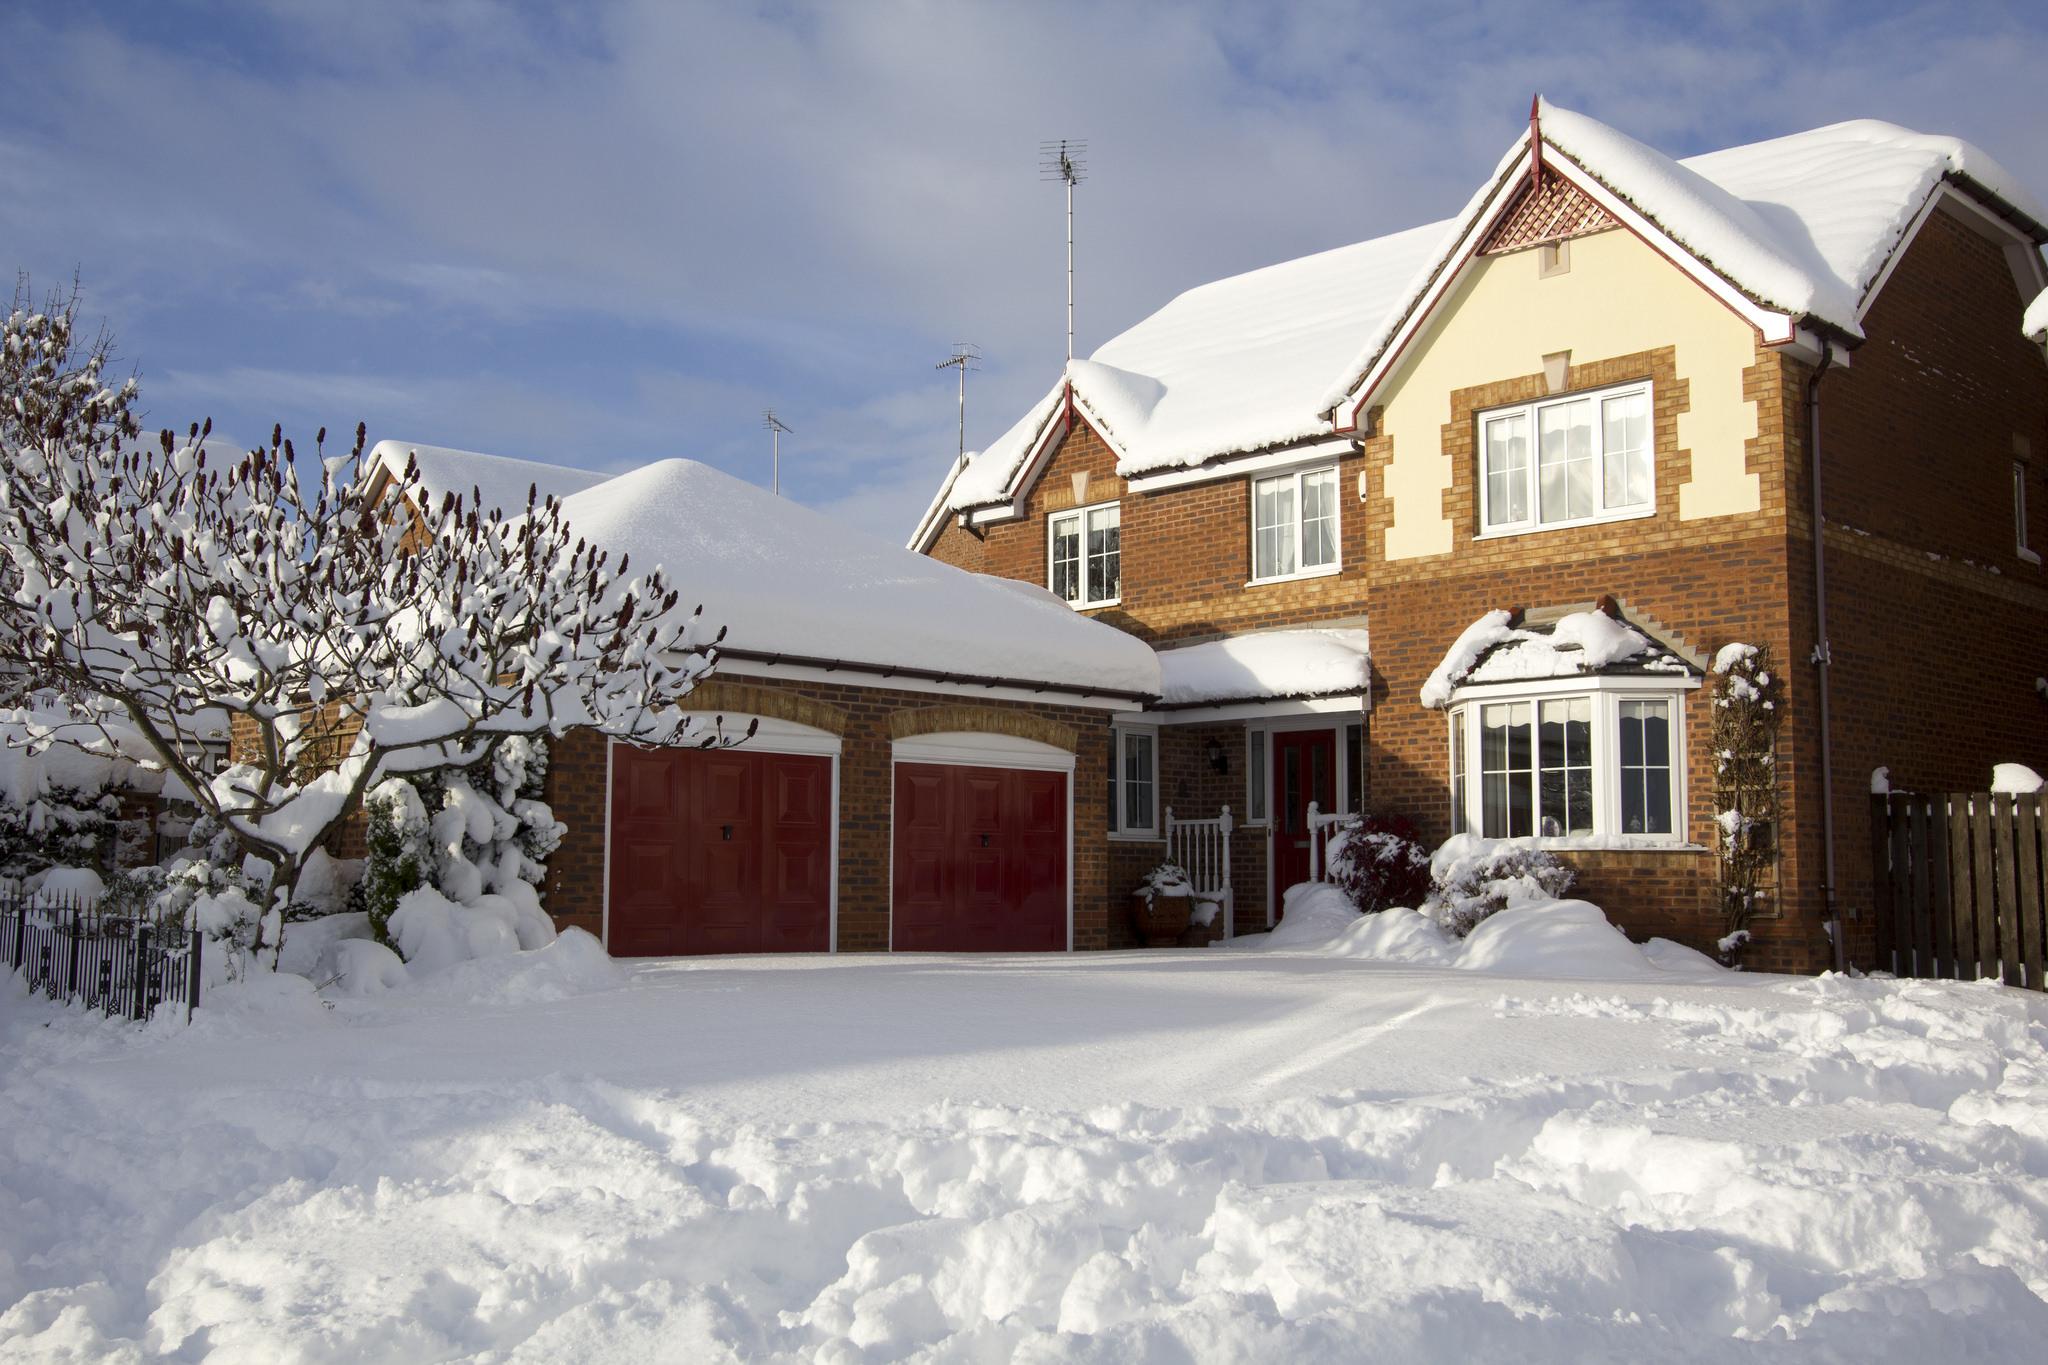 Energy-Smart Ways to Save Money In Winter